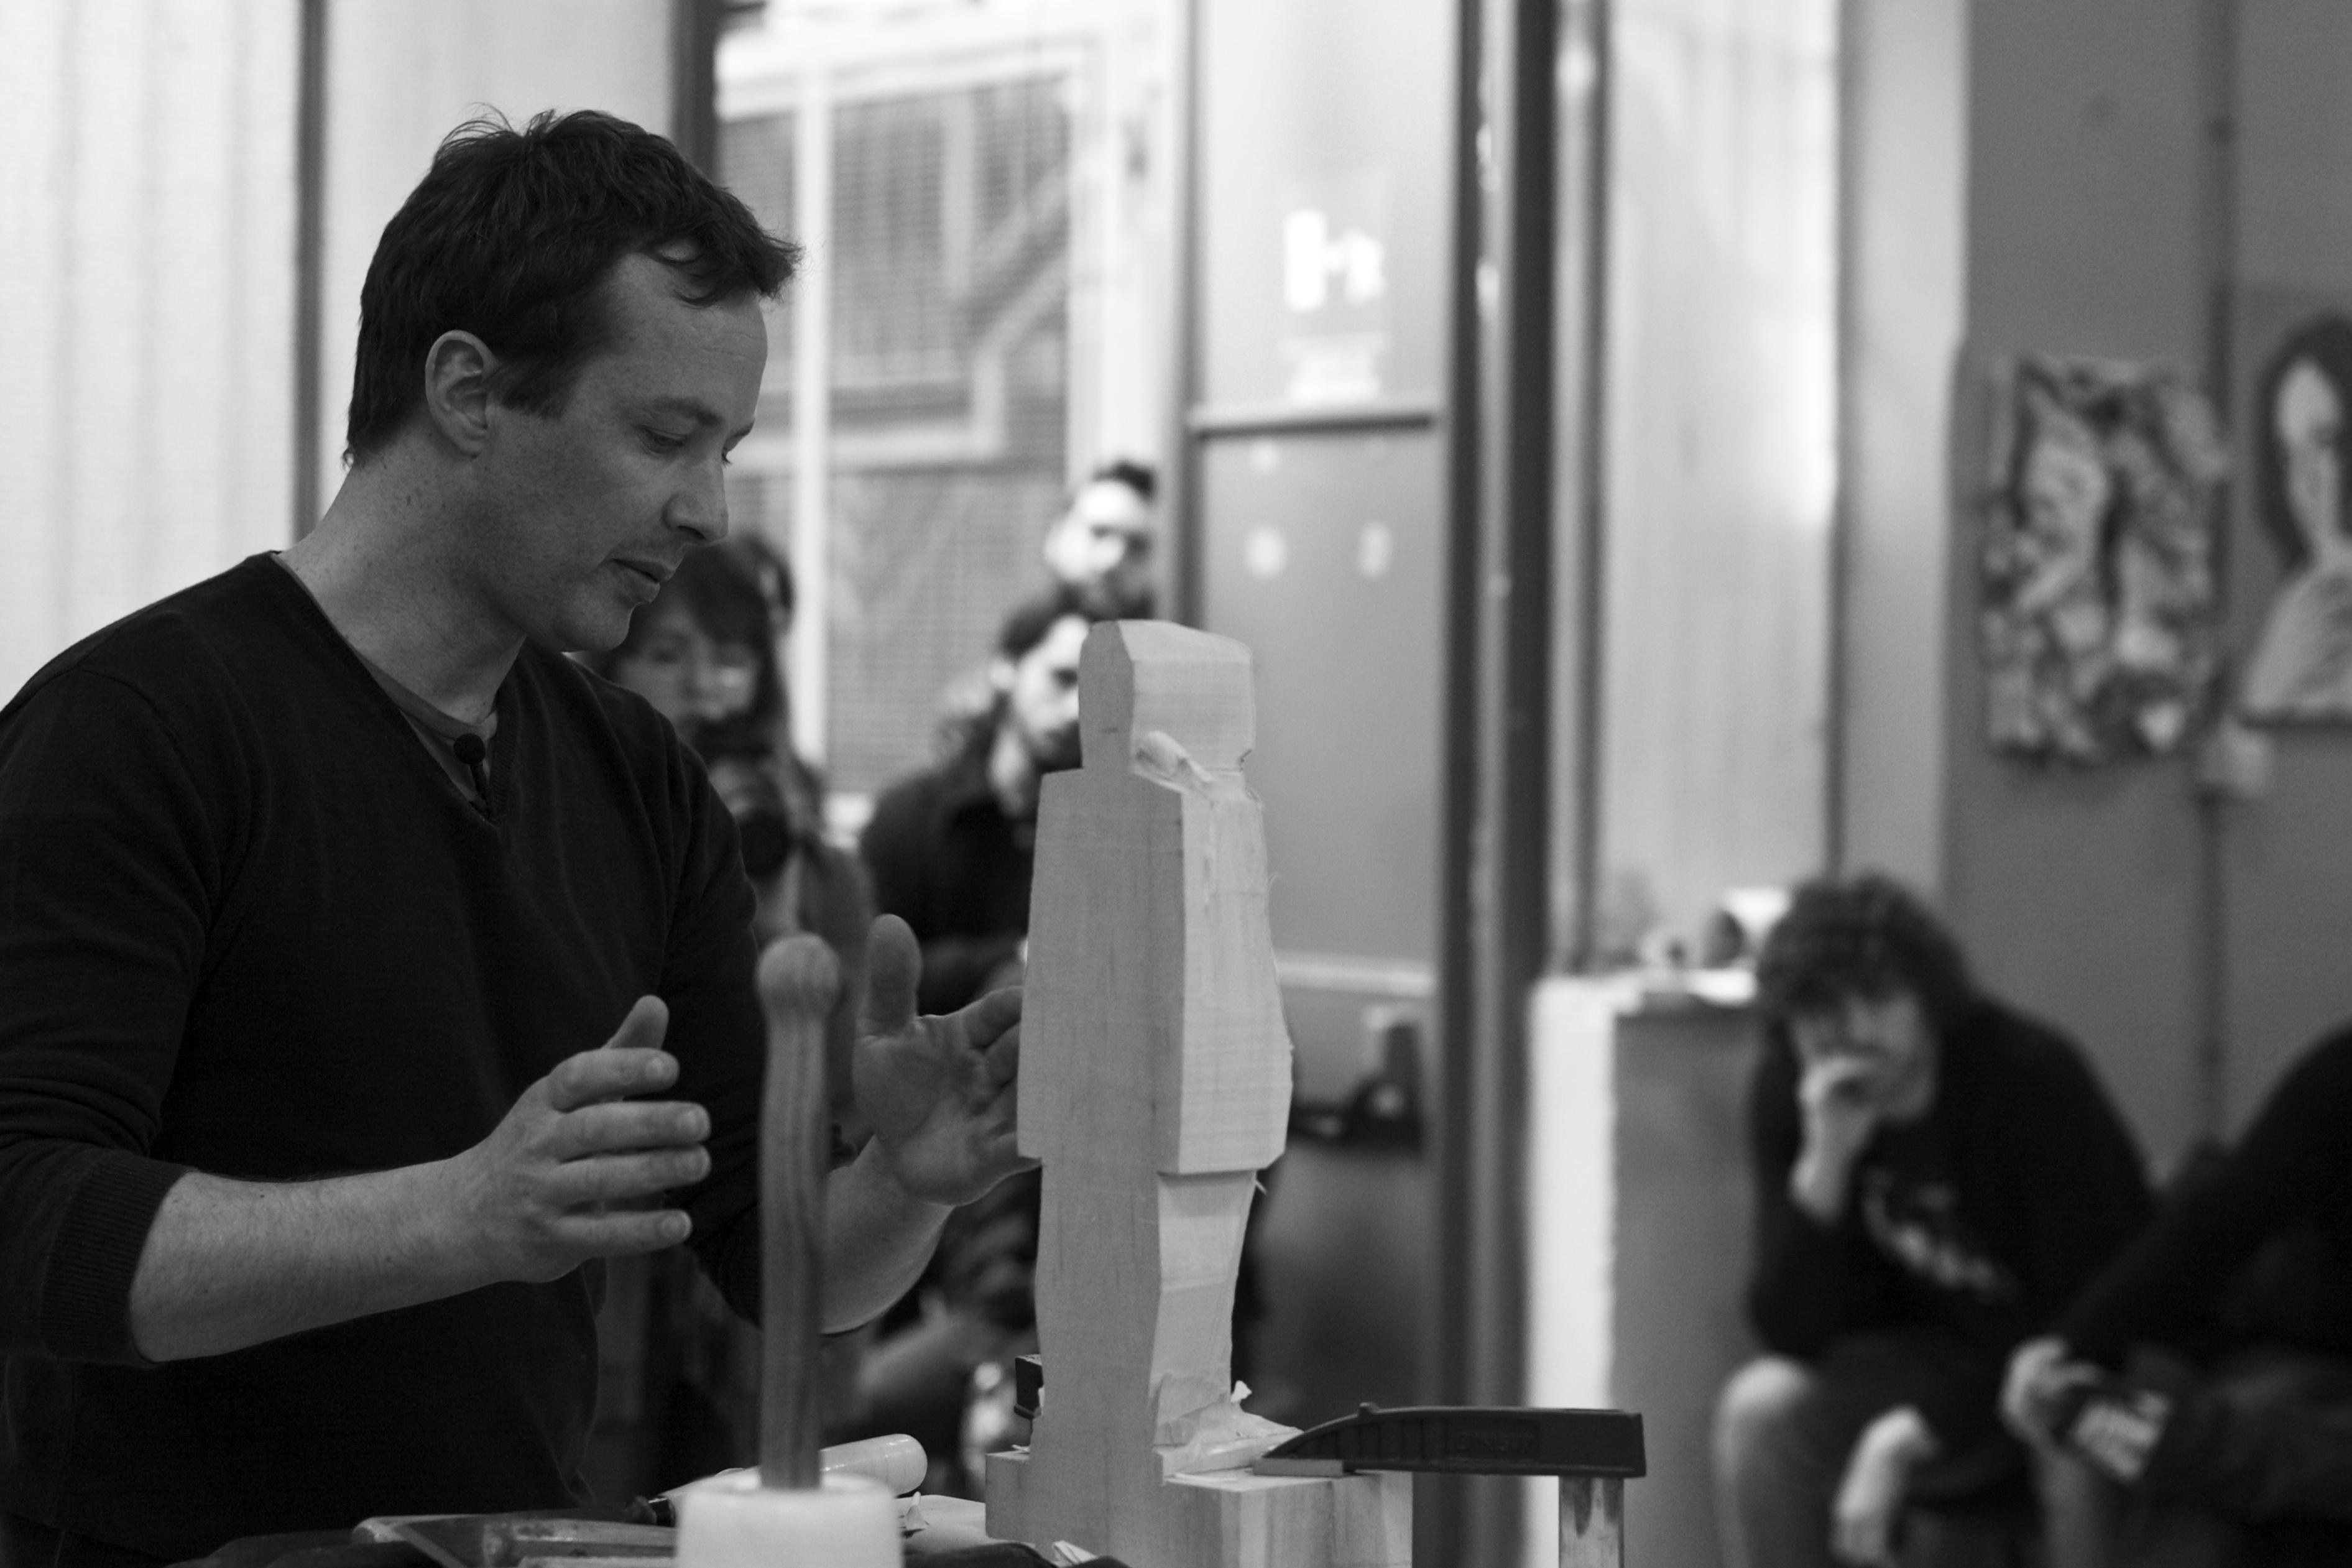 Flickr - Aron Demetz - Dialoghi e materia - Workshop a cura di Franco Reina63